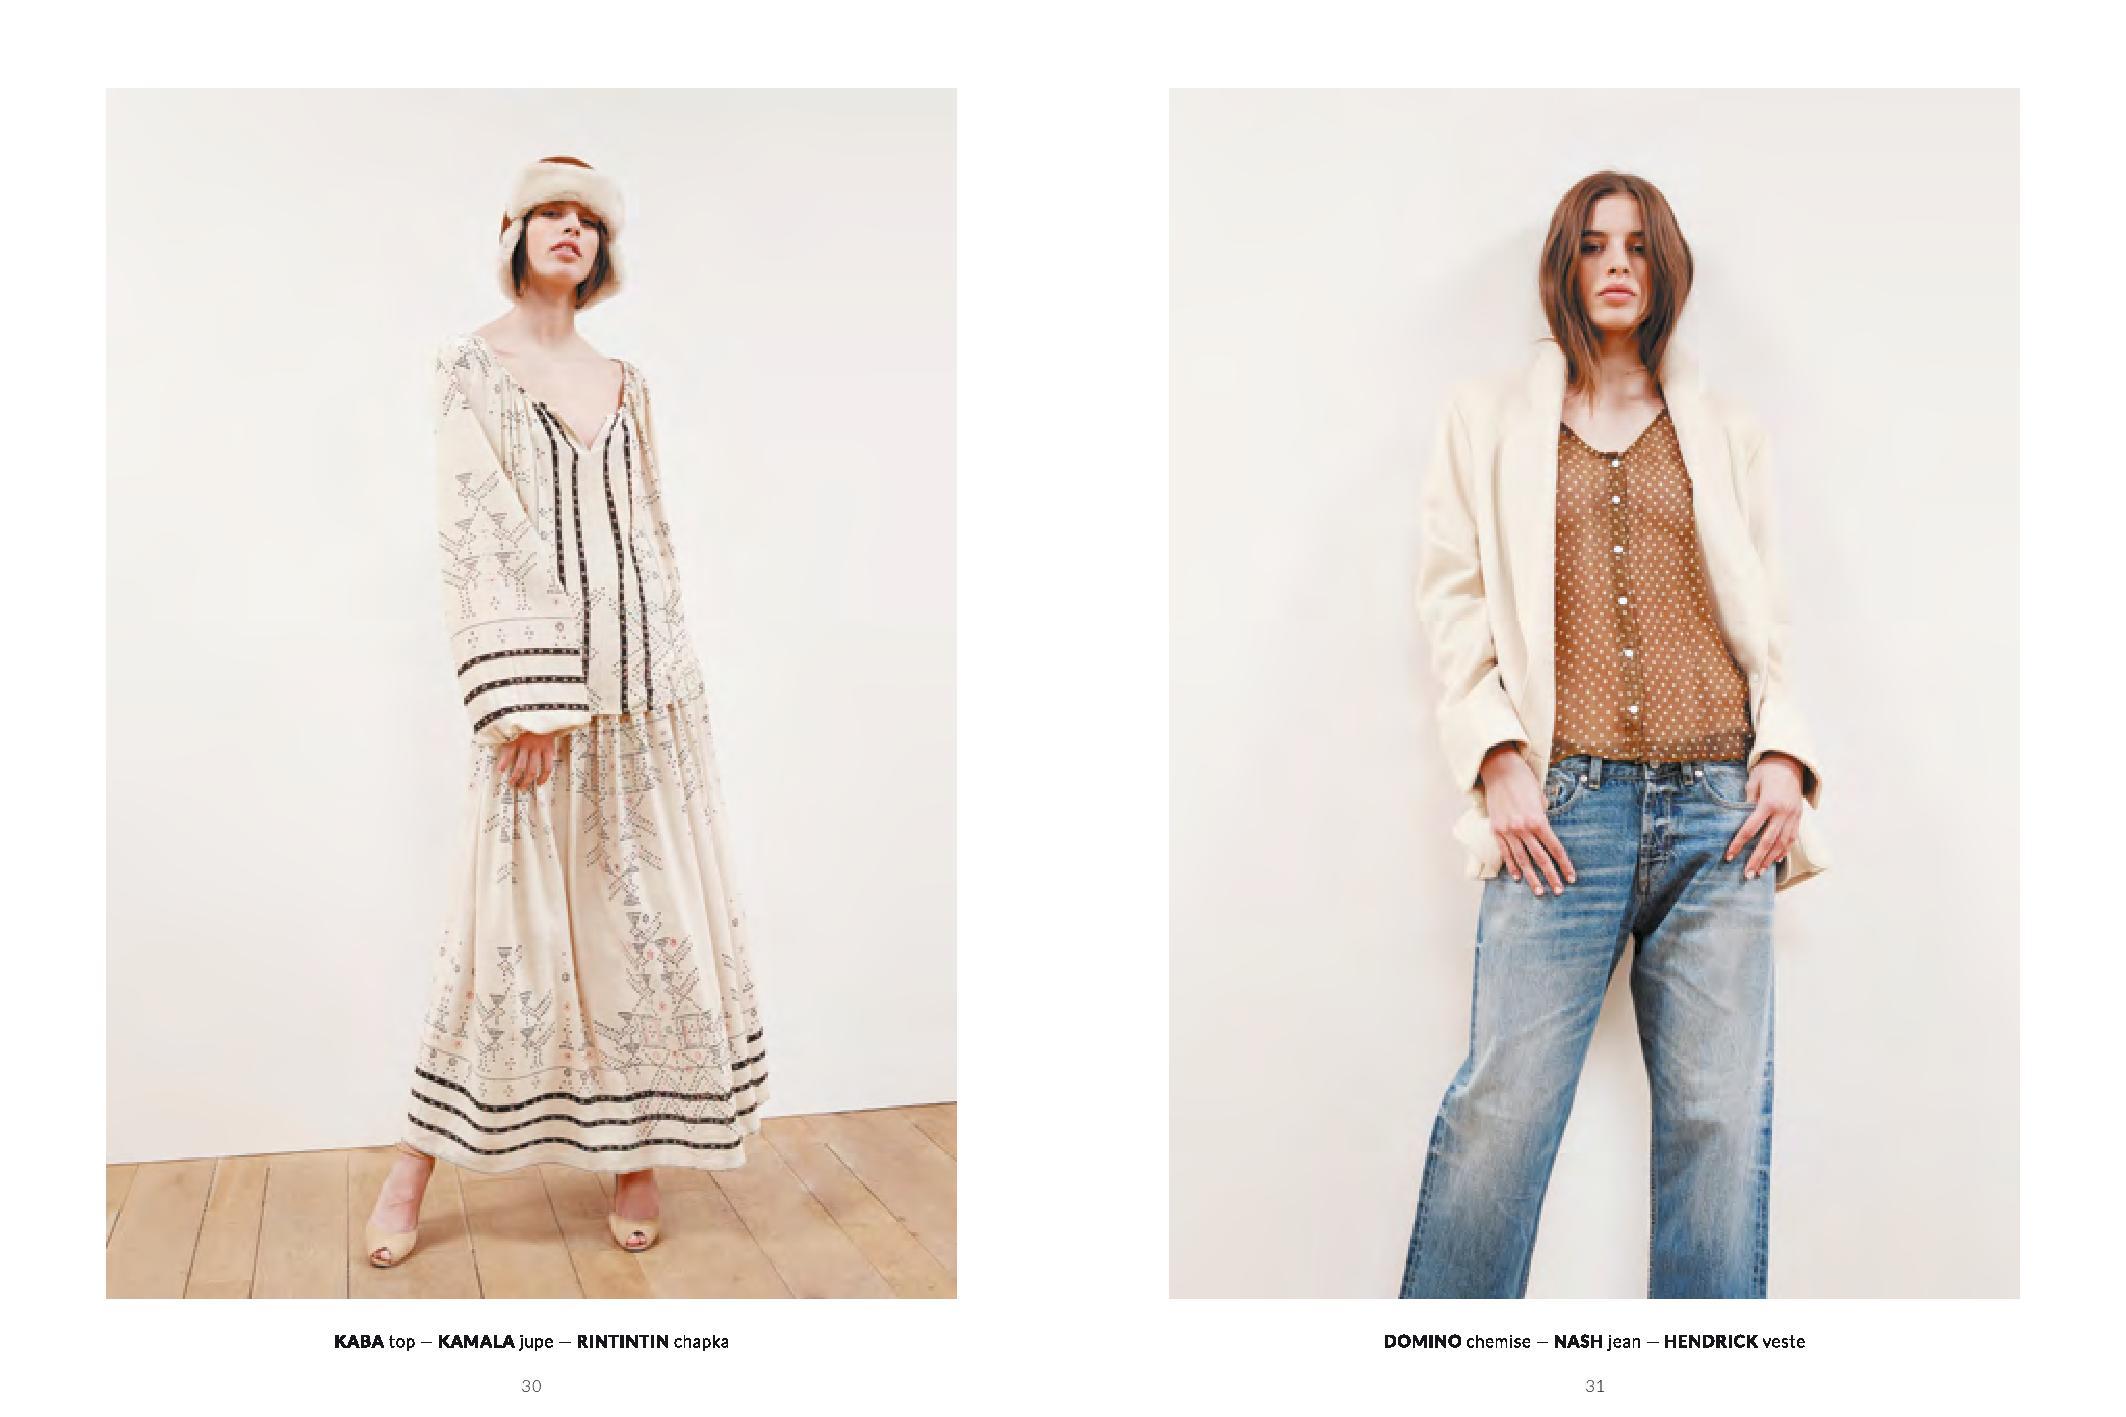 6f_md_lookbook_mes_demoiselles_paris_web_dresscode-page-018.jpg